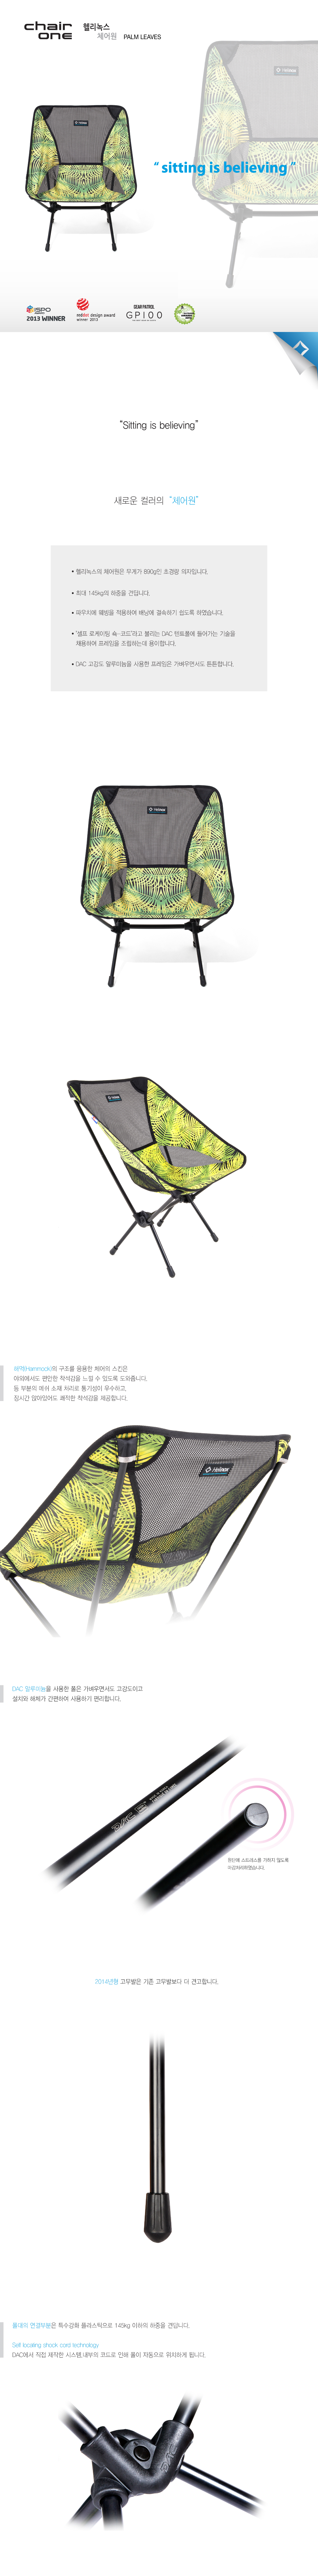 20160713-Helinox_chair-one_상품페이지_PALM-LEAVES.jpg